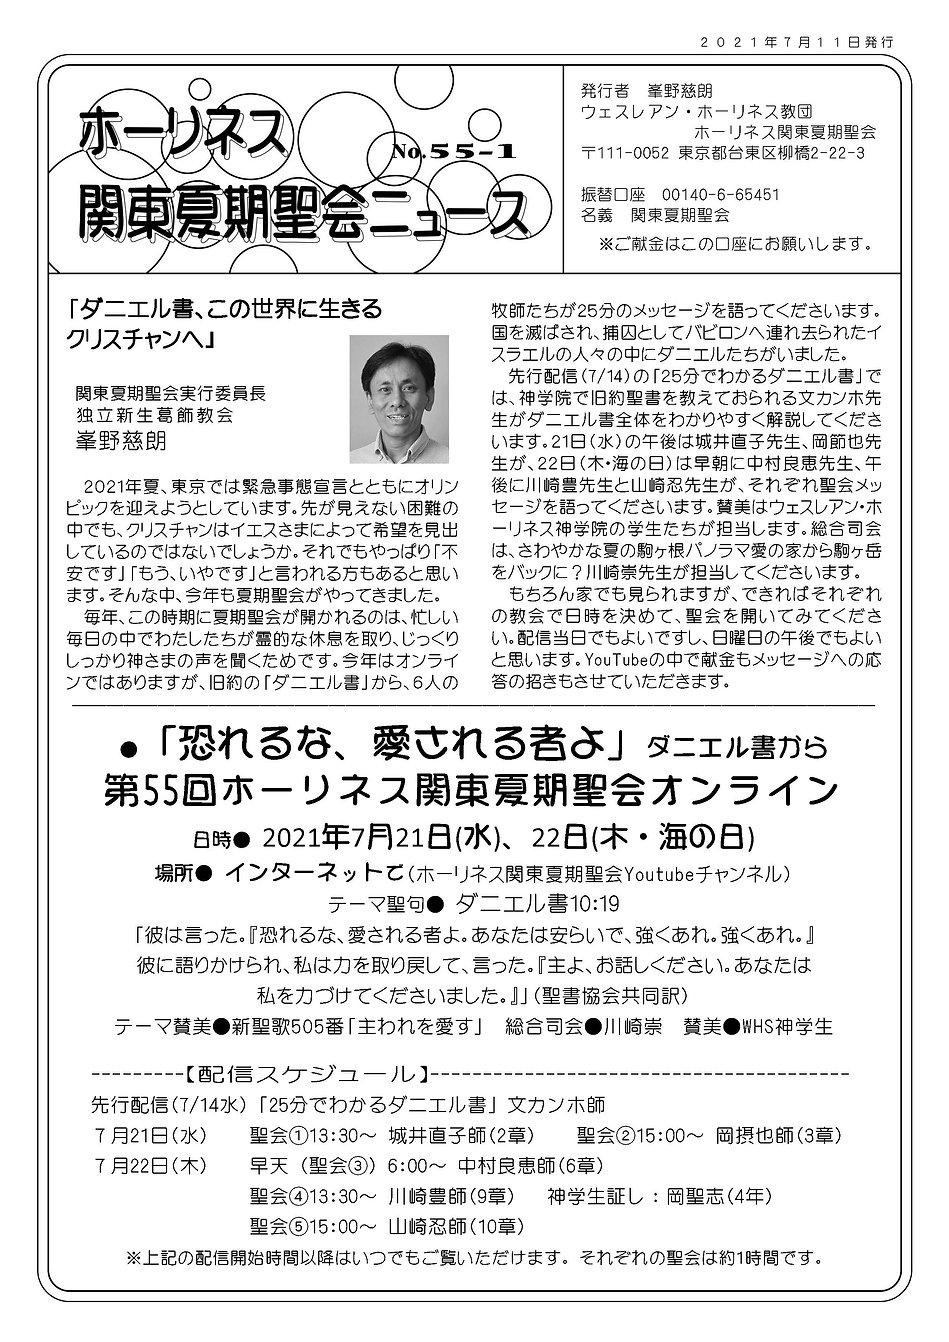 夏期聖会ニュース55-1.jpg